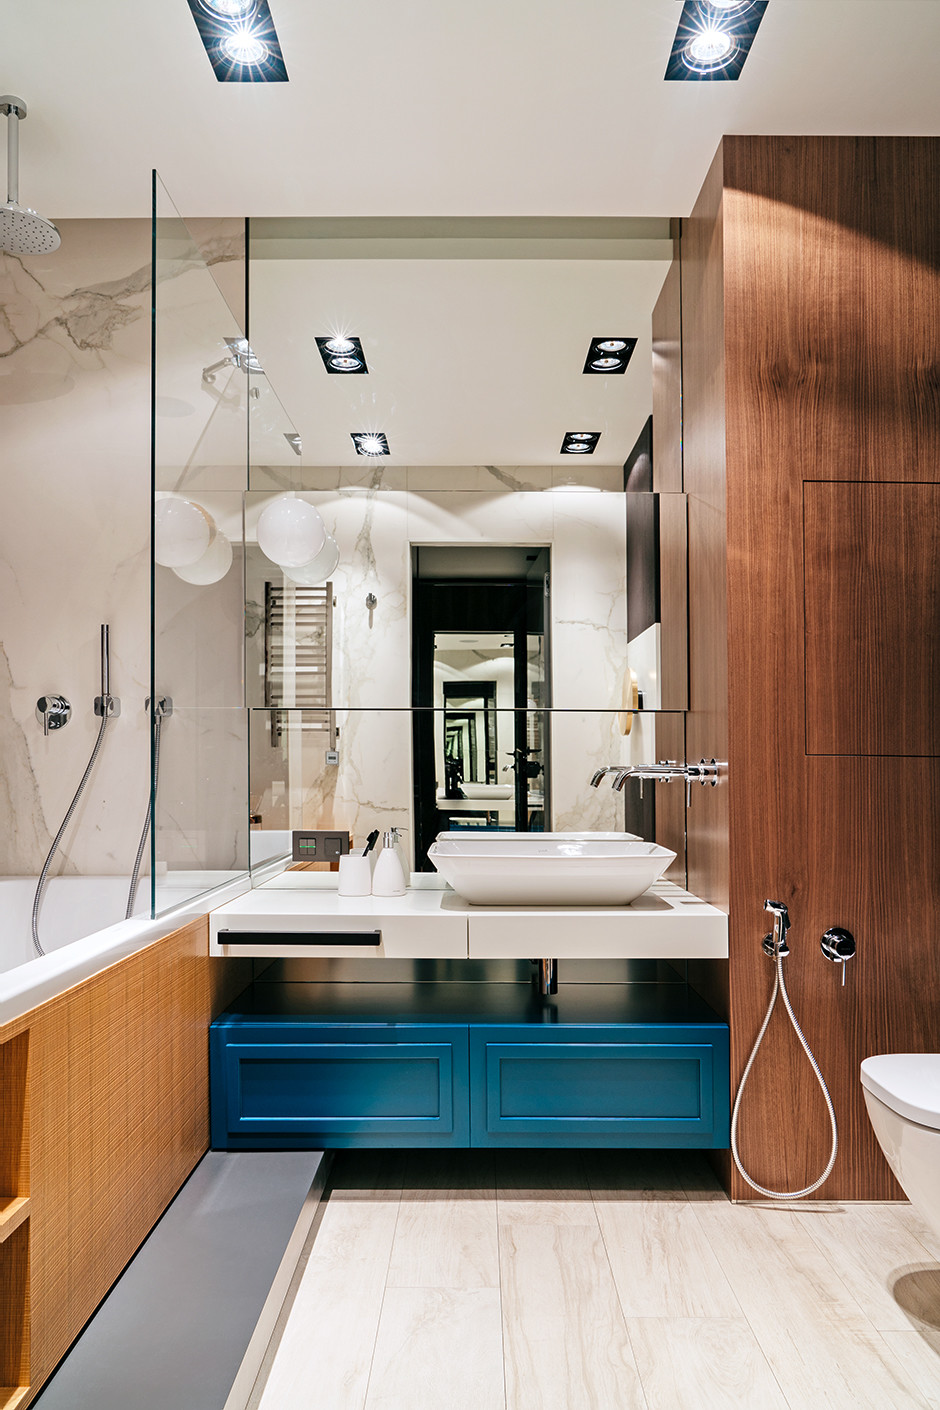 дизайн маленькой квартиры дизайн маленькой квартиры Дизайн маленькой квартиры  1 e2eadd7606088559123493077fa1fc93  0xc0a839a4 11319618961485937653